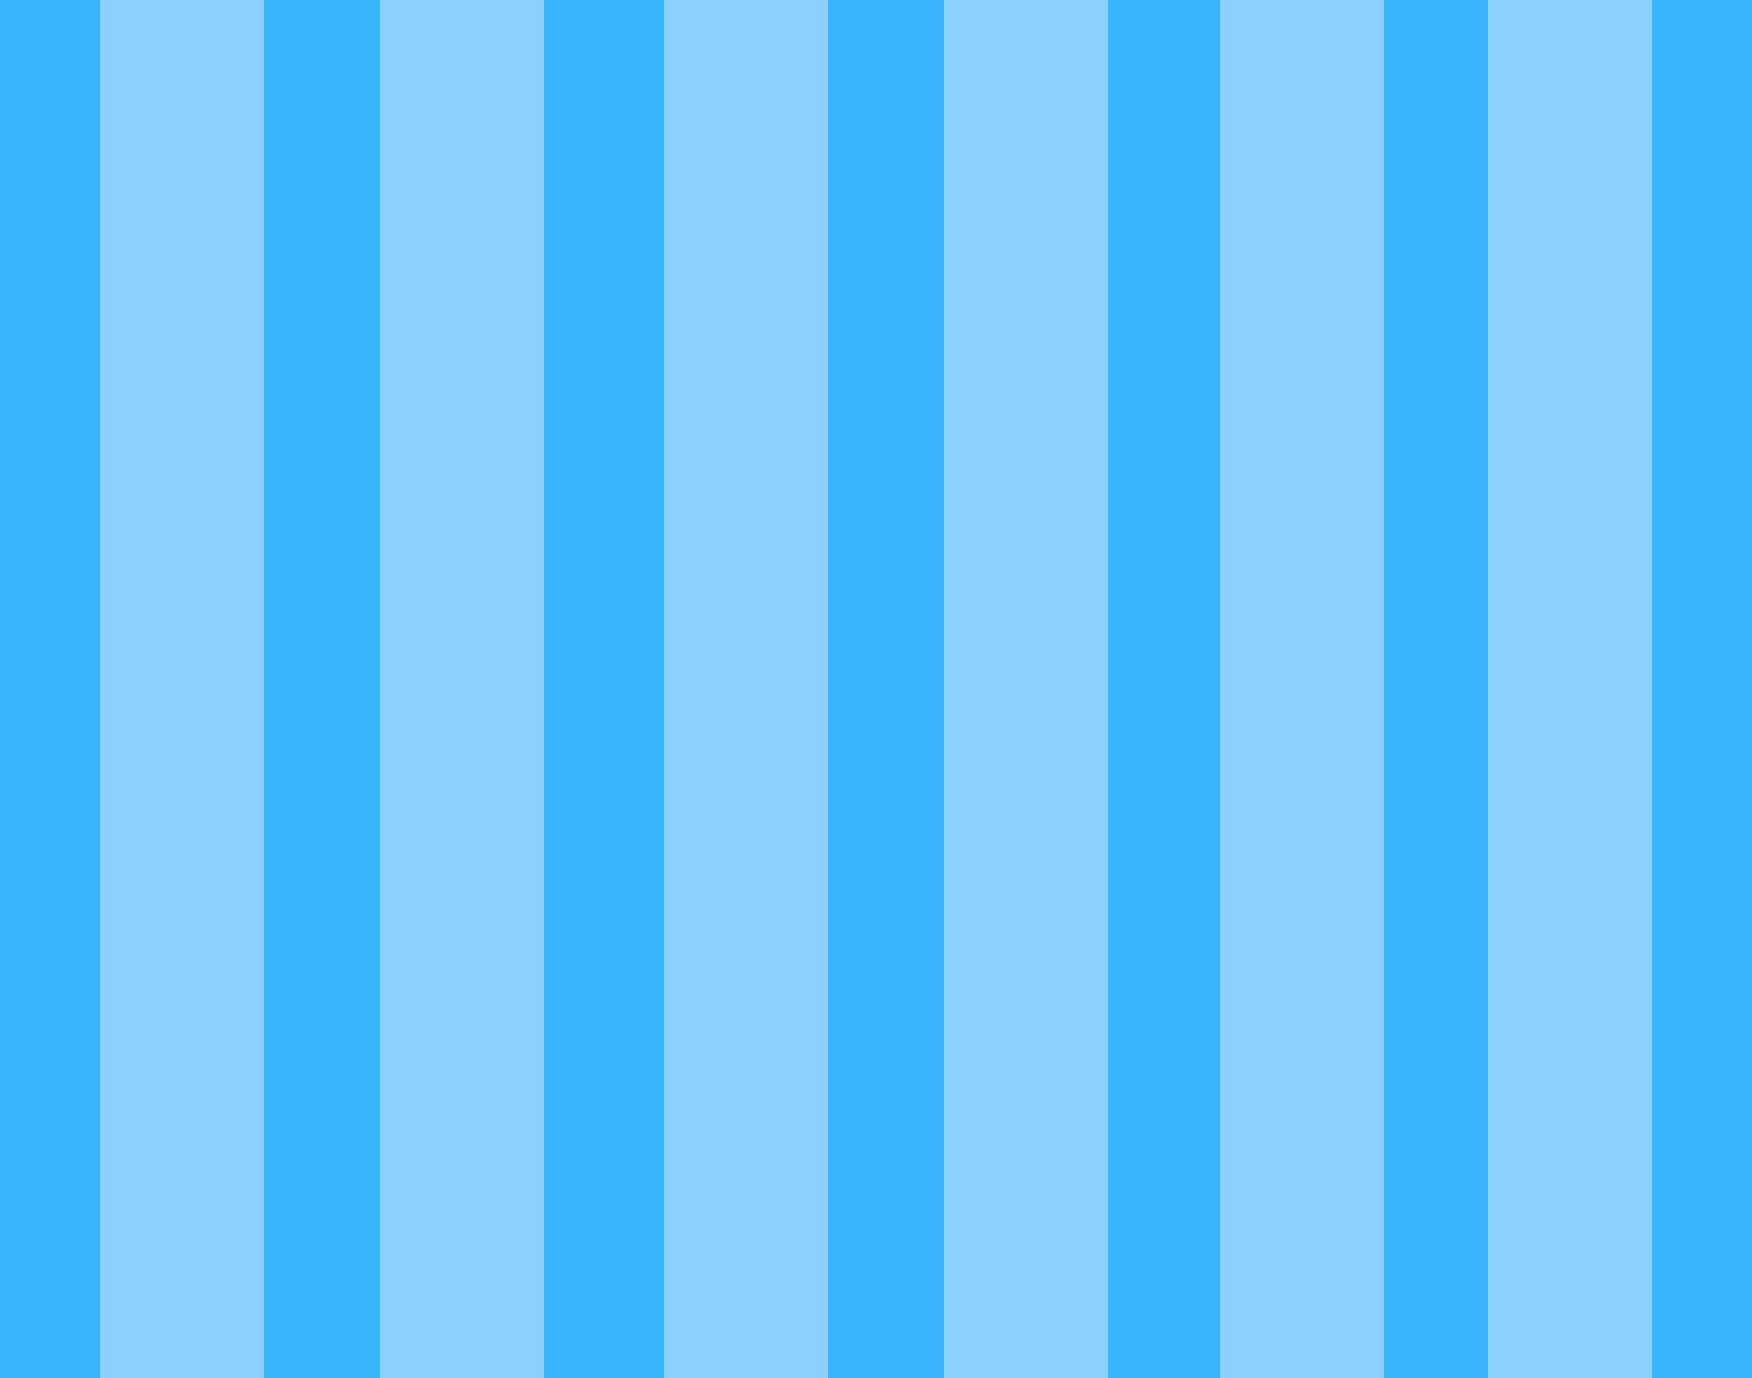 Blue Striped Wallpaper: Baby Blue Stripes Wallpaper